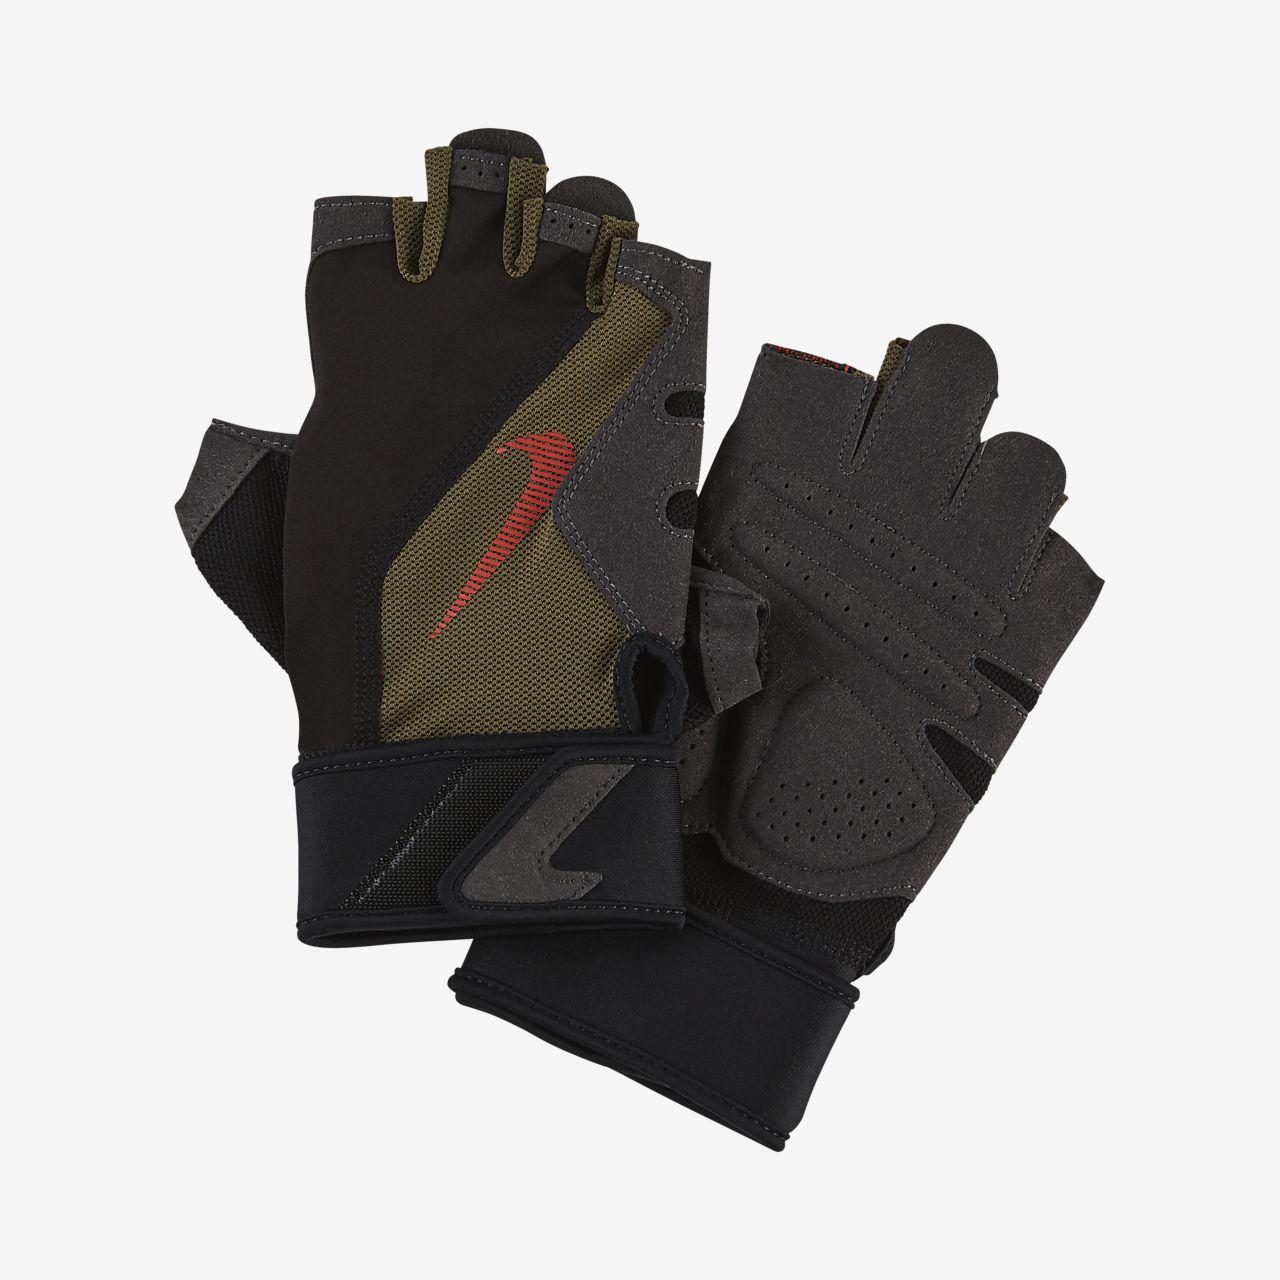 Nike Premium 男子训练手套(1 副)